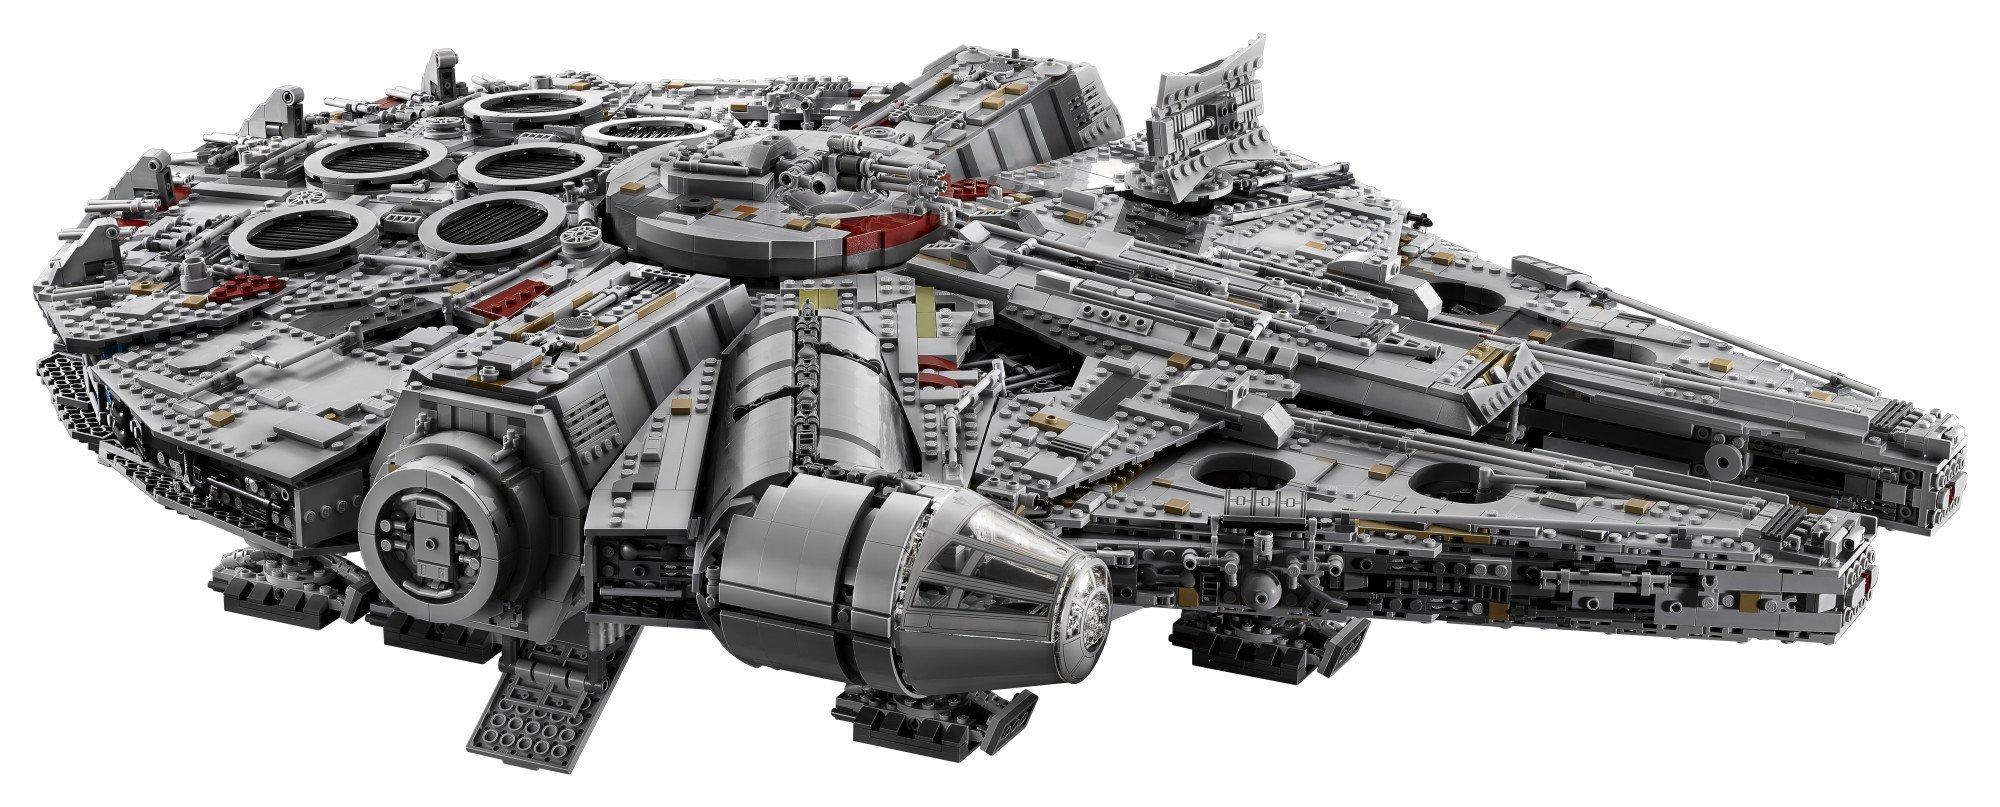 LEGO Star Wars Millennium Falcon 75192 Building Kit (7541 Piece) by LEGO (Image #3)